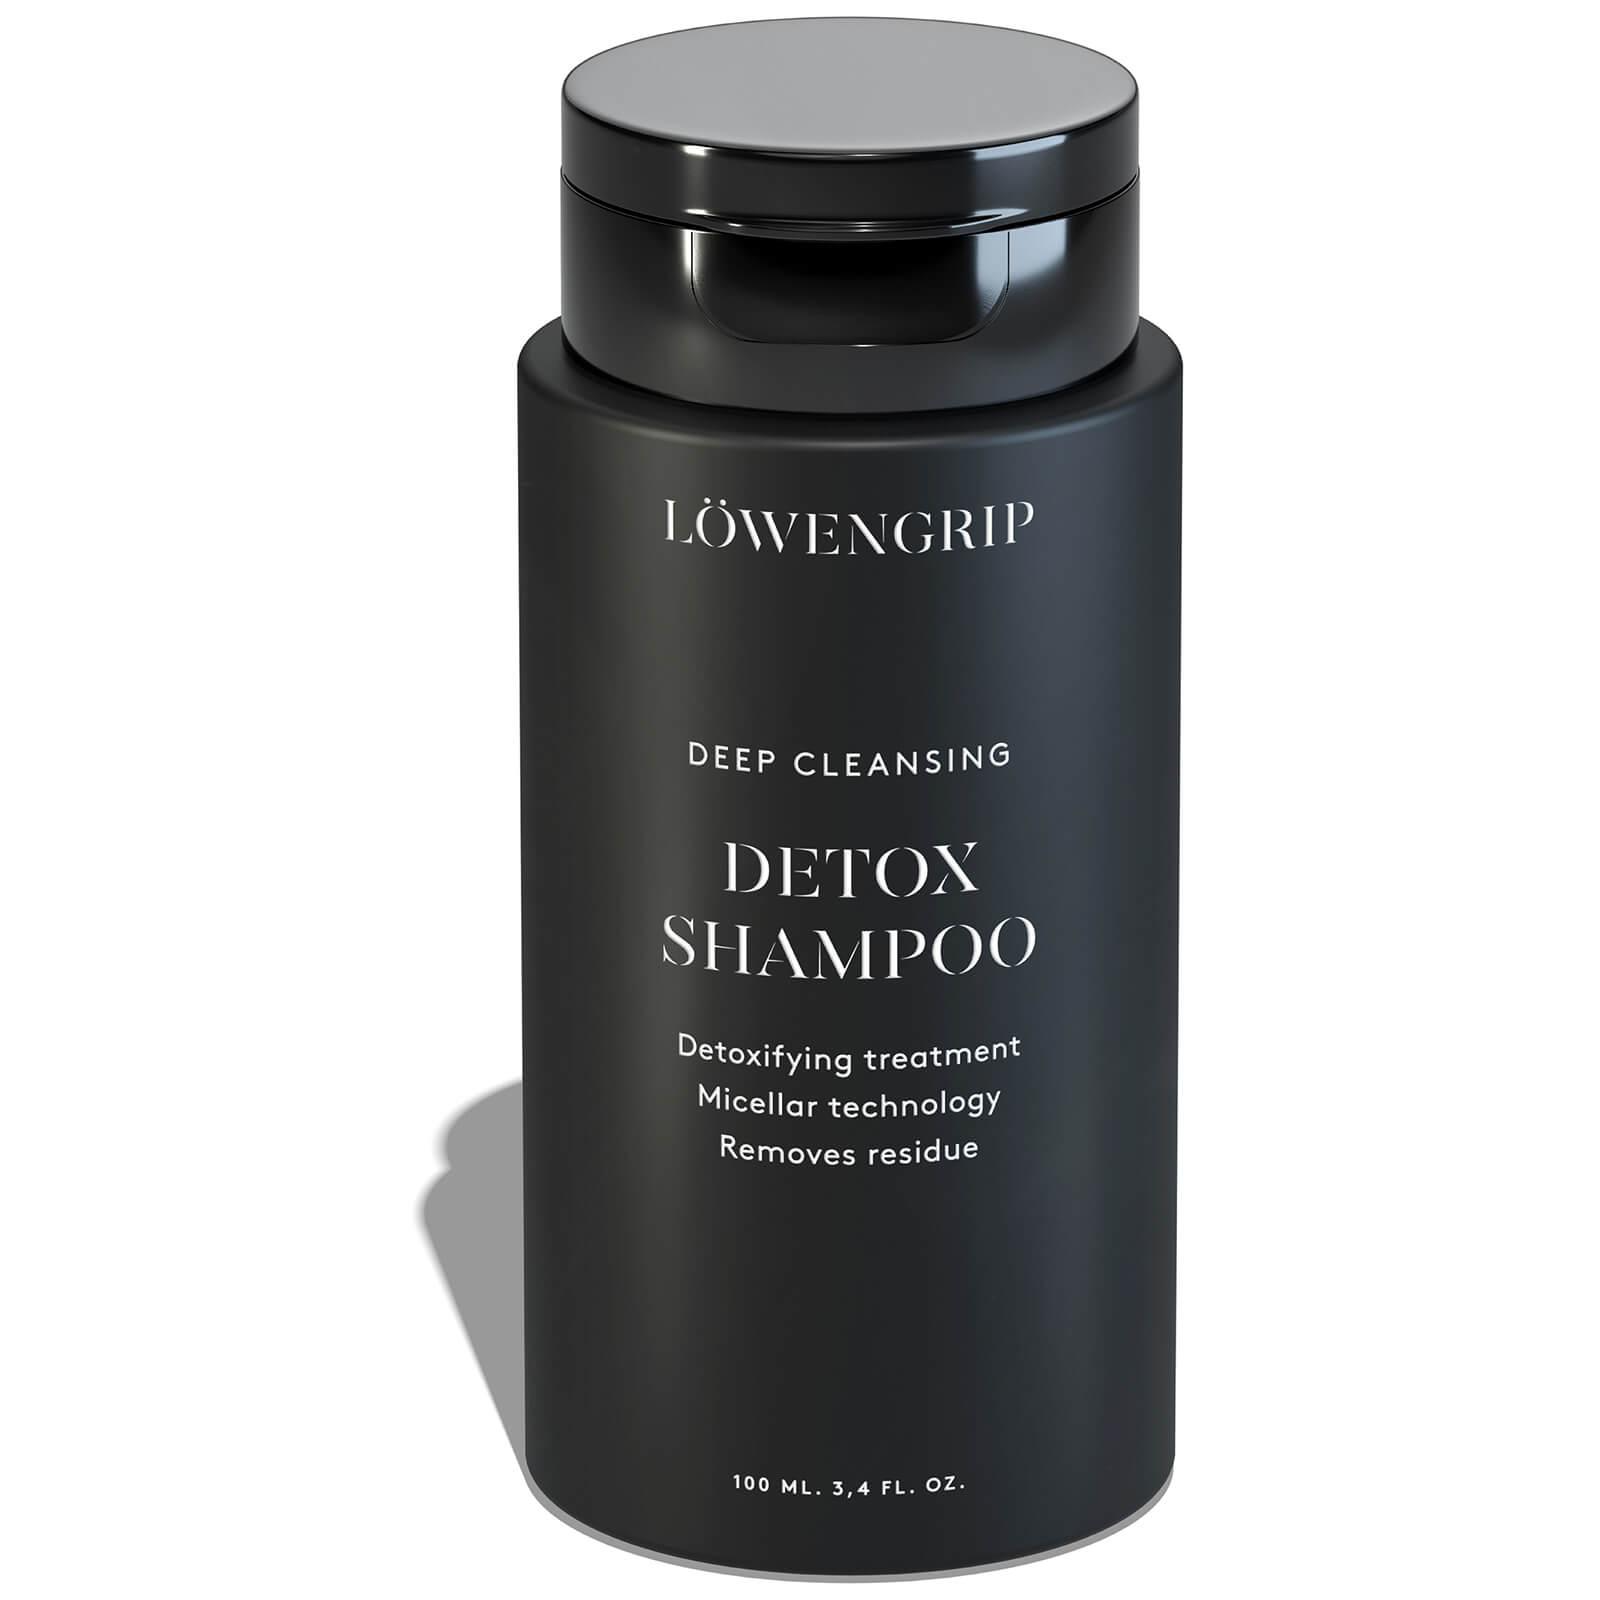 Löwengrip Deep Cleansing Detox Shampoo 100ml